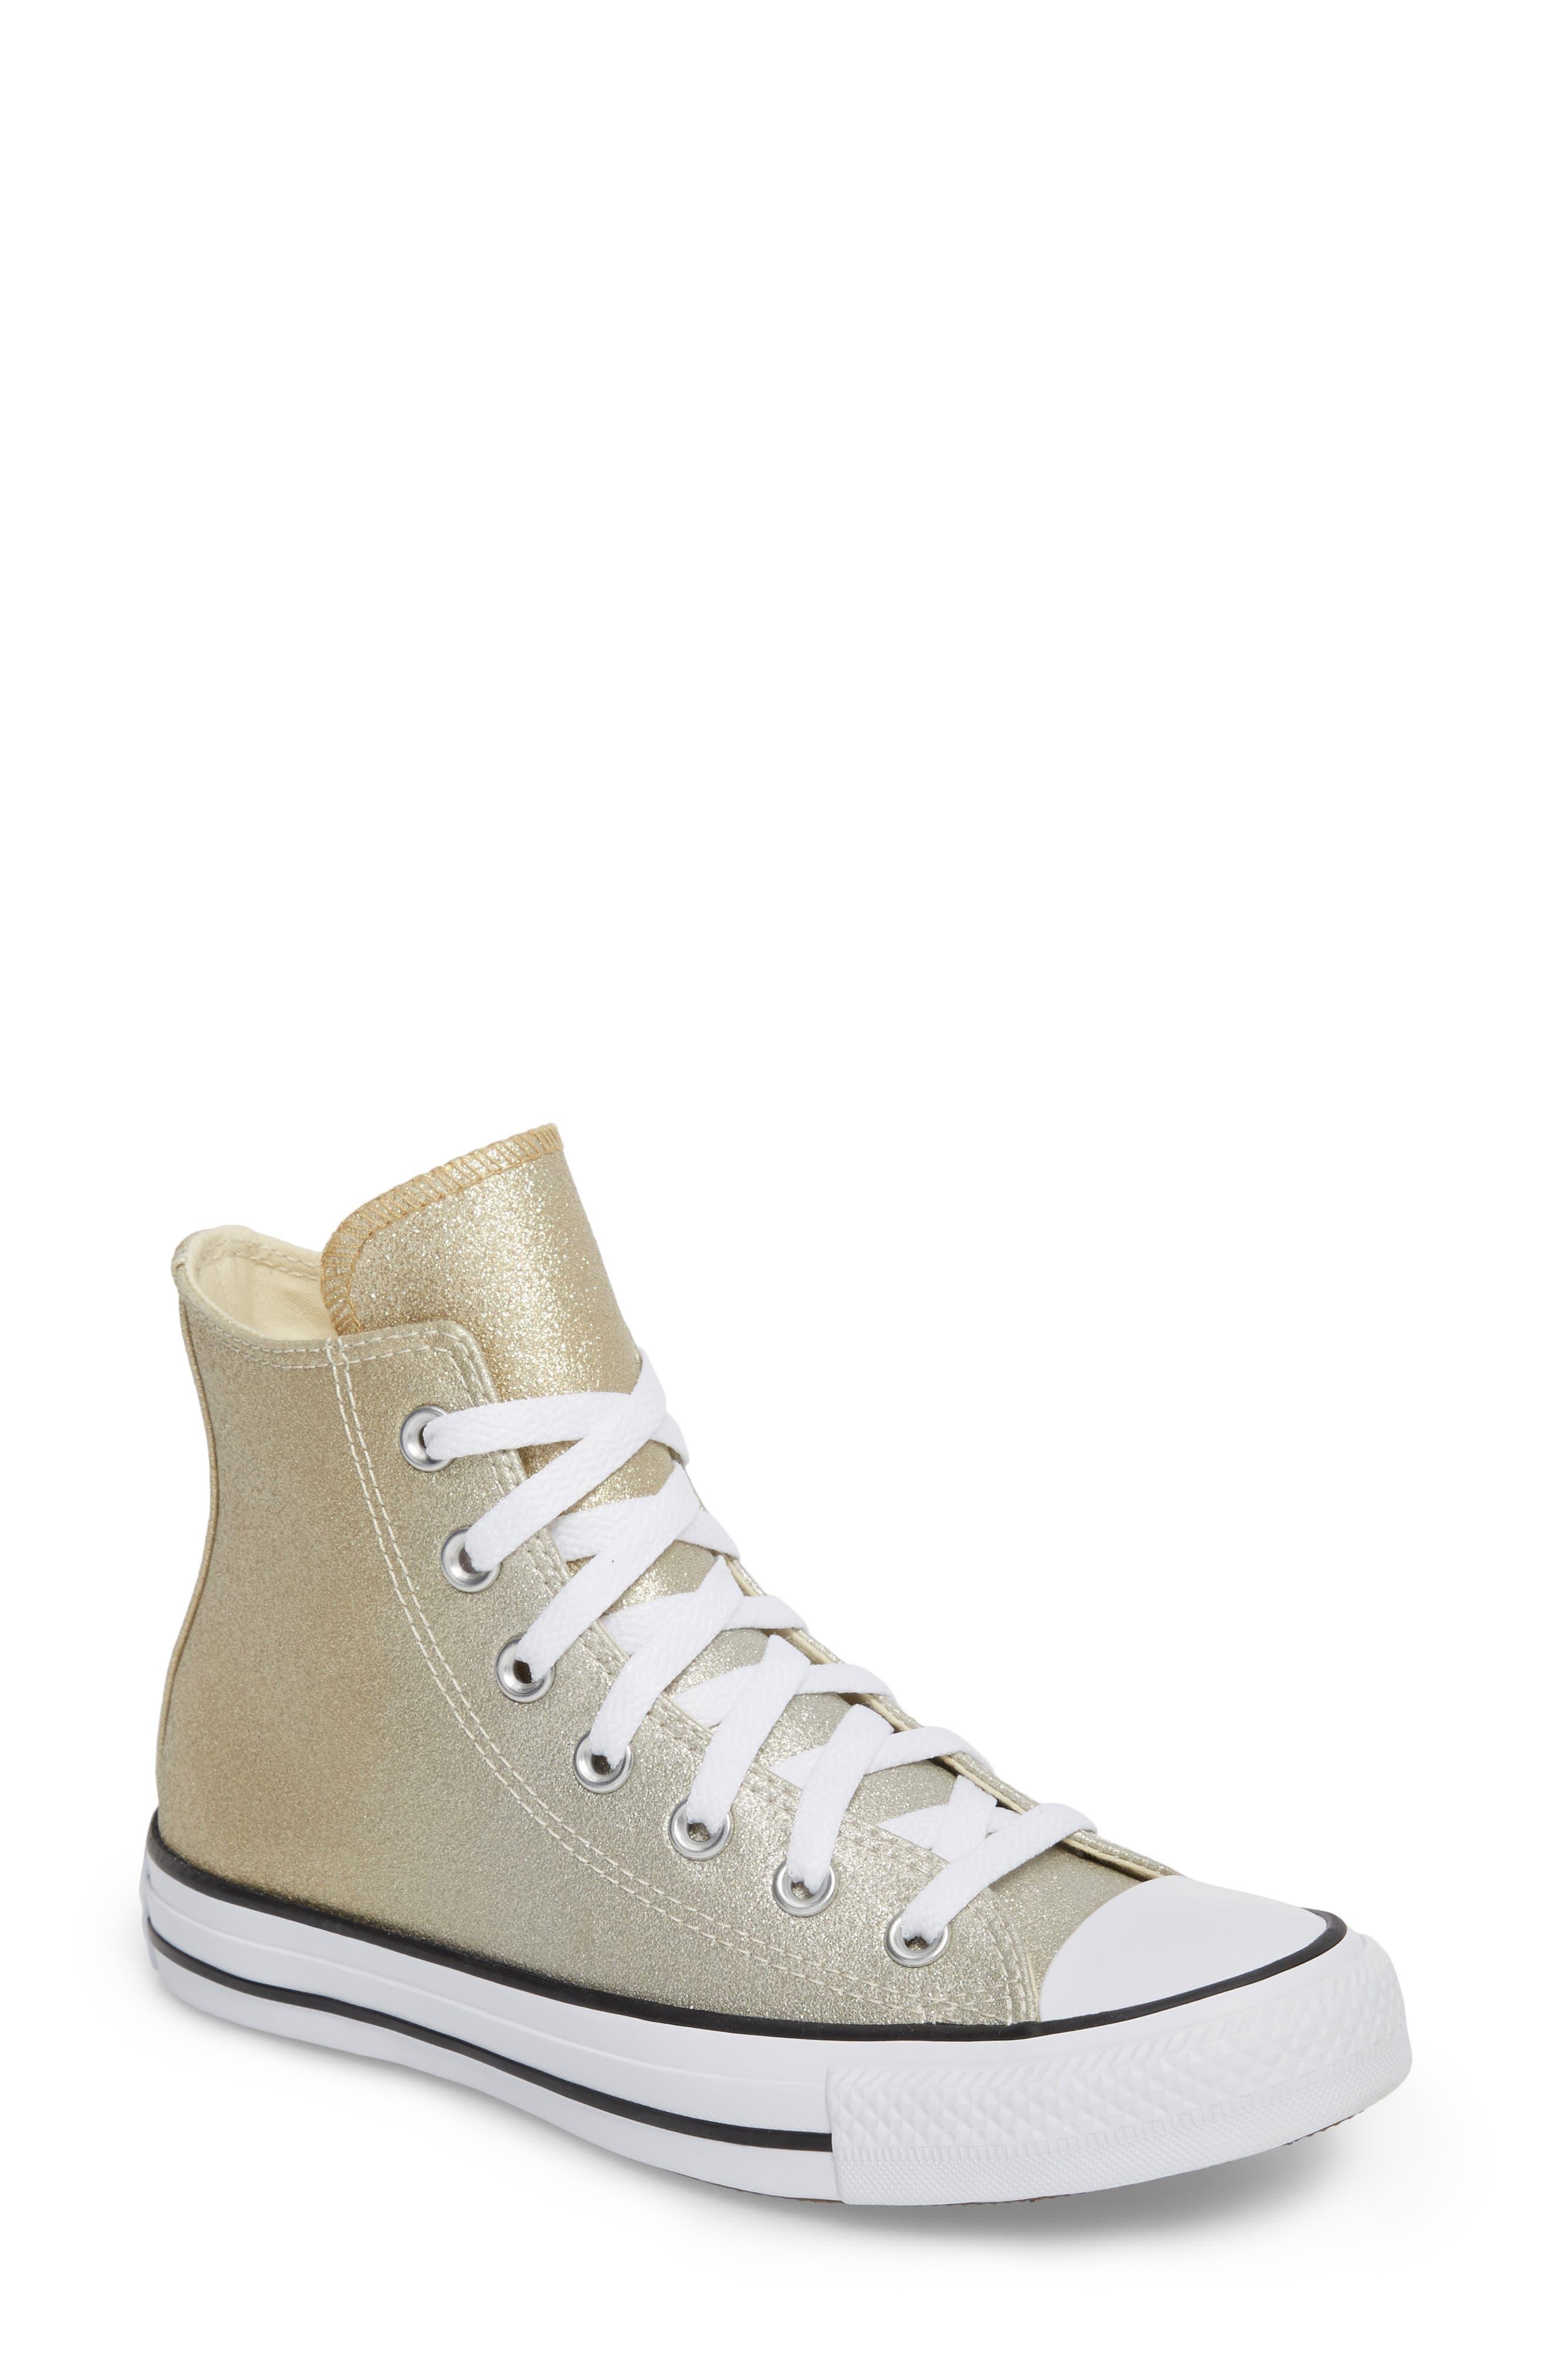 CONVERSE Chuck Taylor<sup>®</sup> All Star<sup>®</sup> Ombré Metallic High Top Sneaker, Main, color, 710